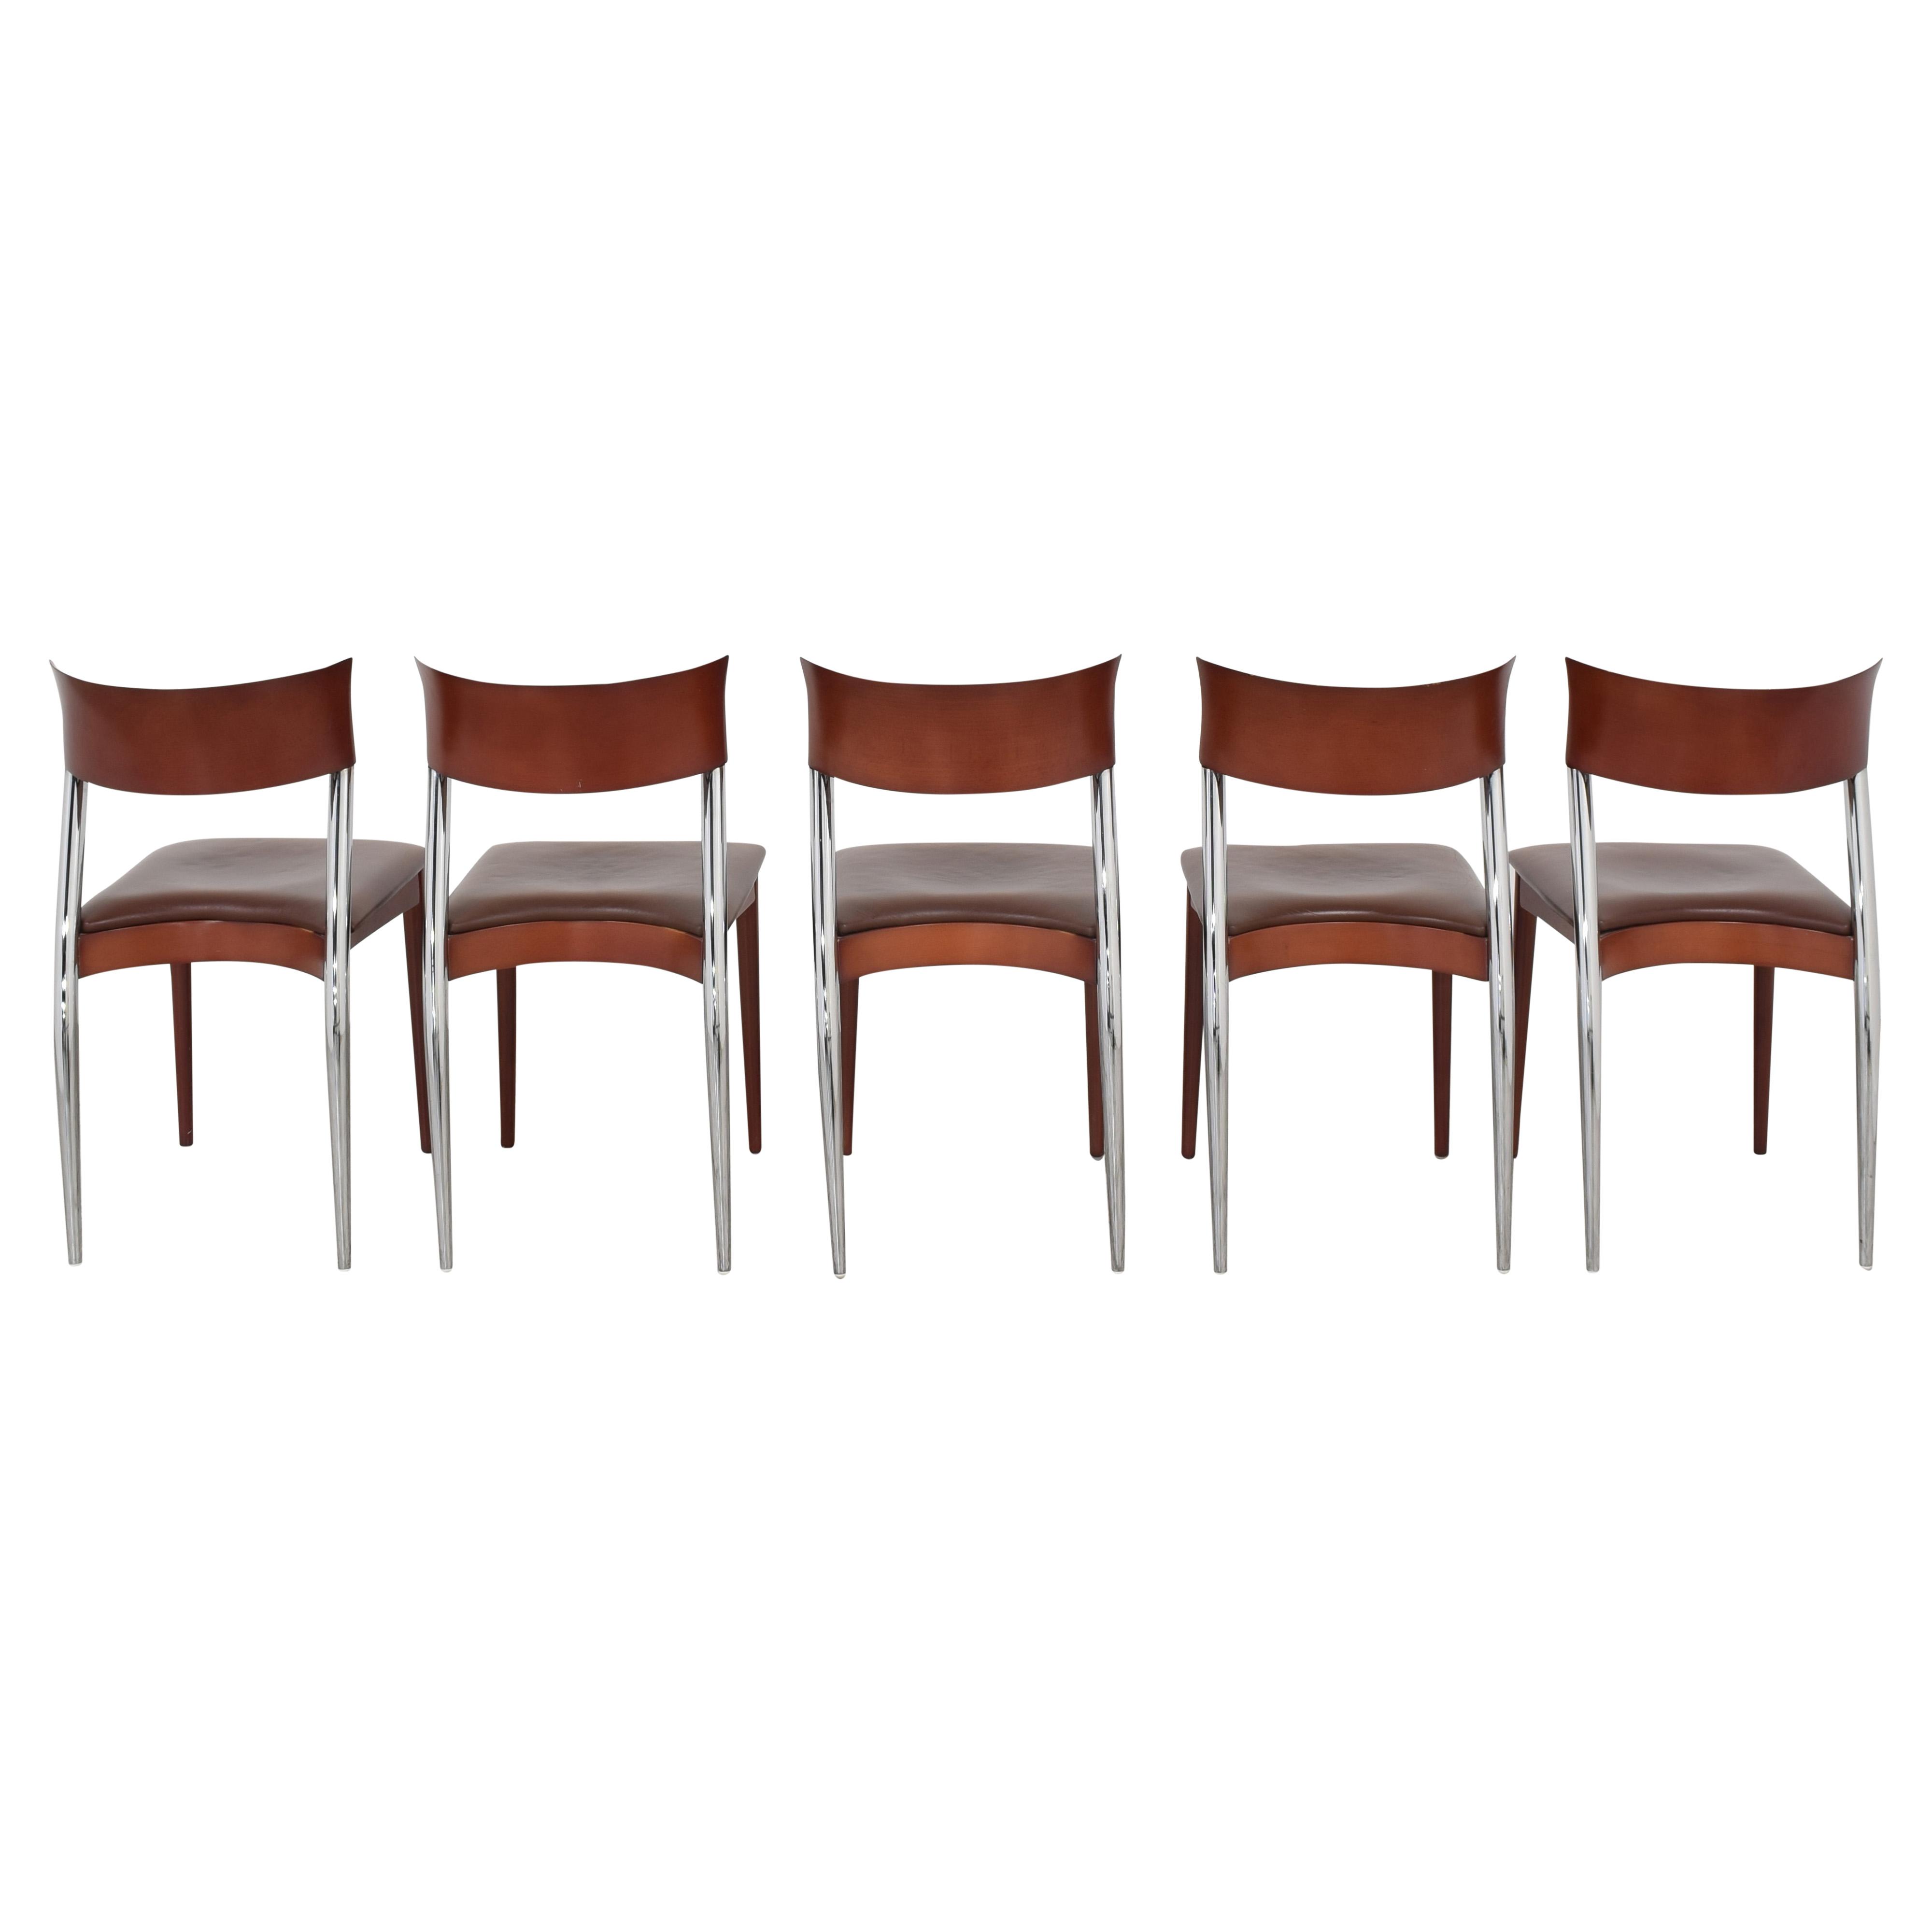 Loewenstein Dining Chairs sale